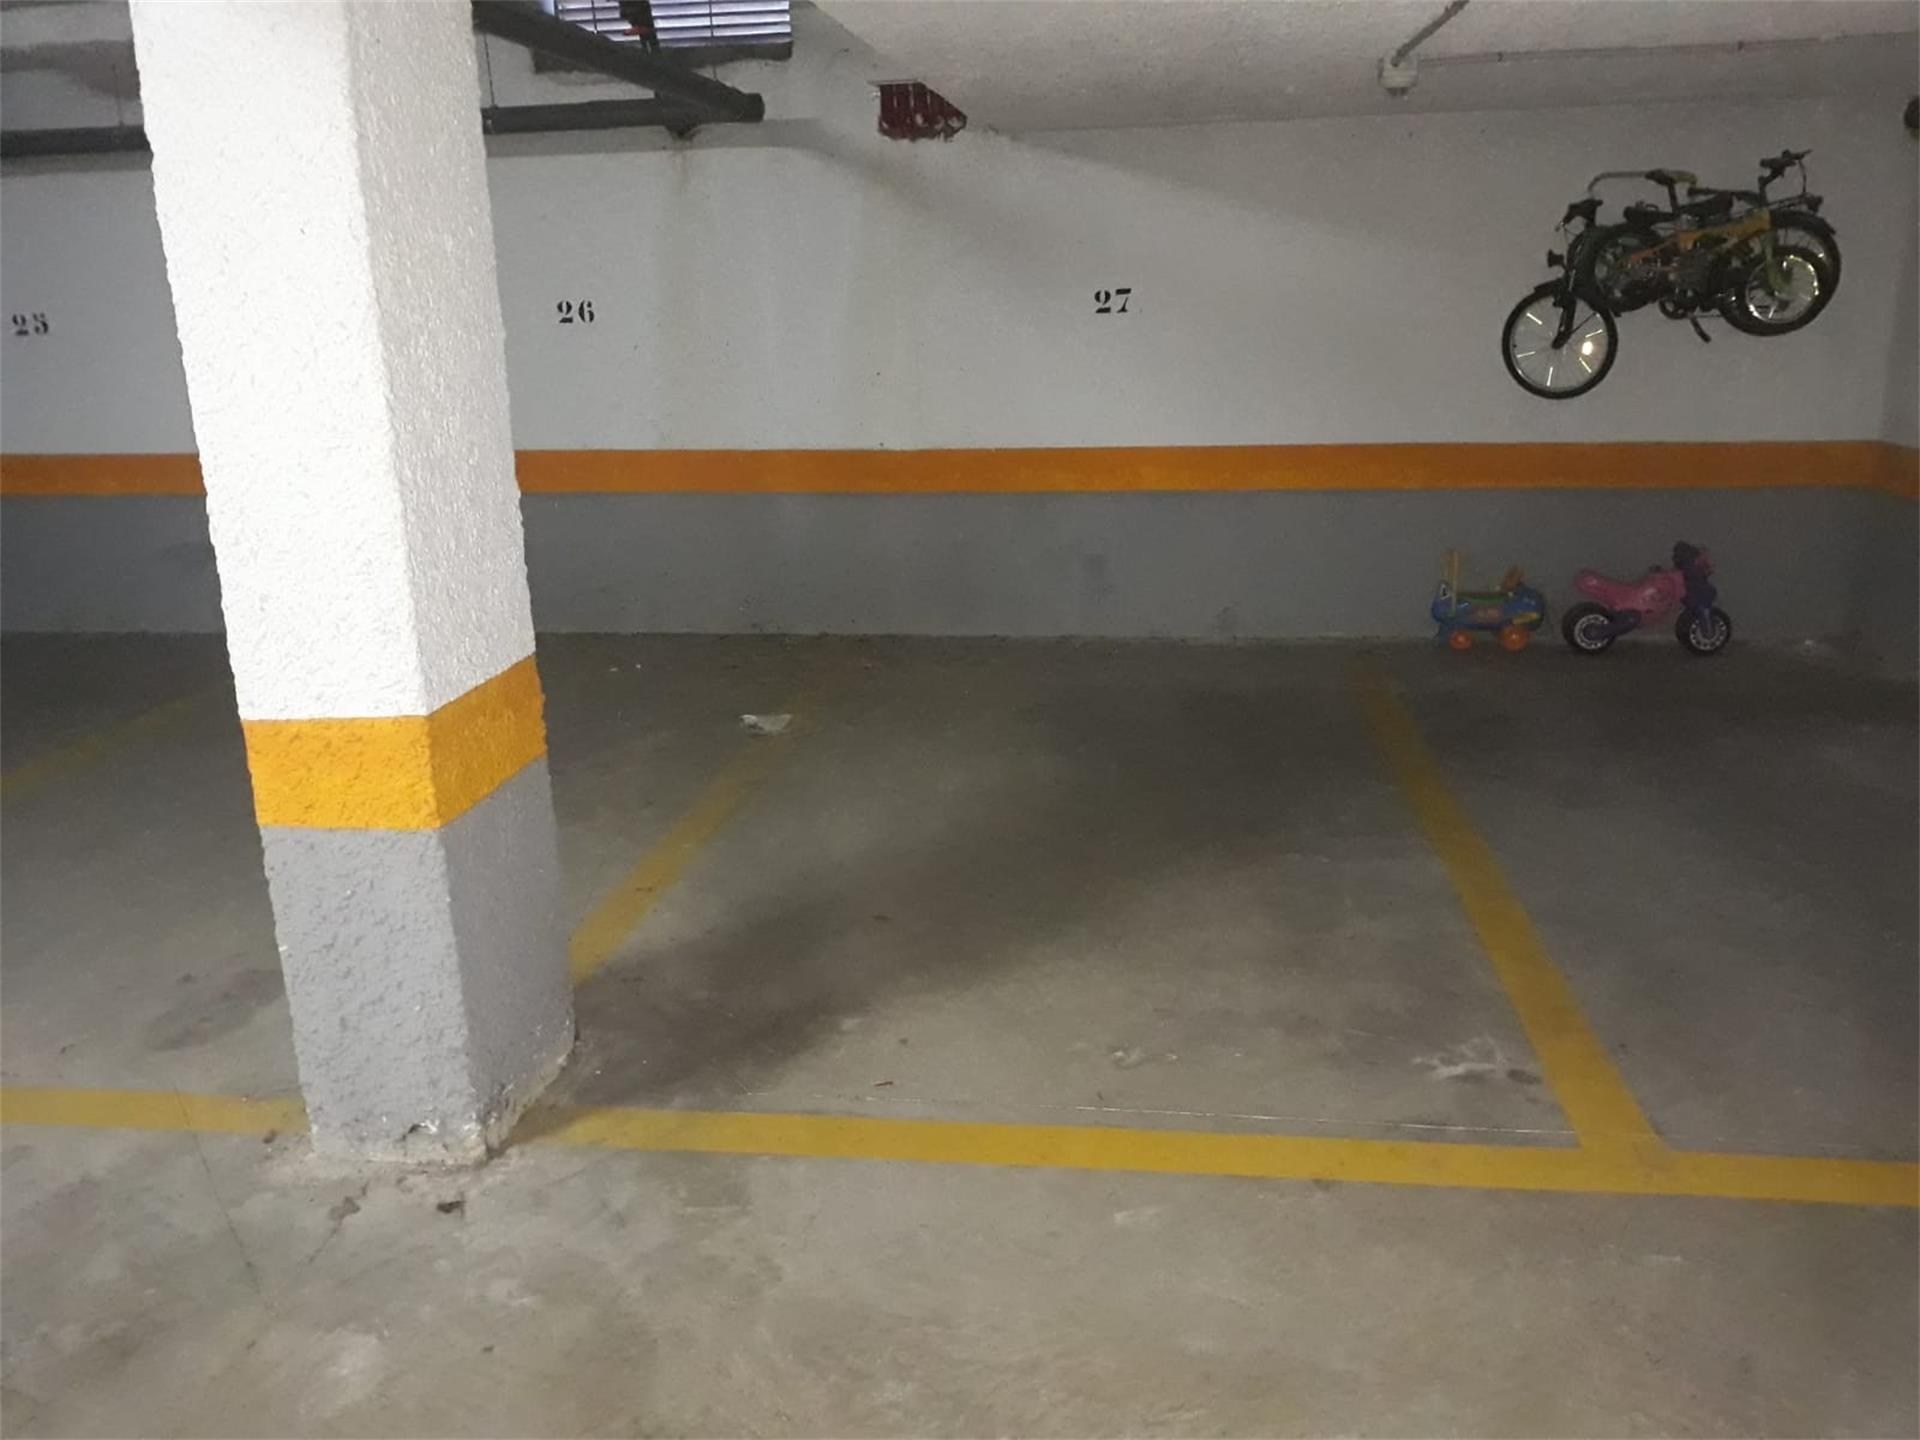 Autoparkplatz  Calle de valencia. Albalat dels sorells / calle de valencia